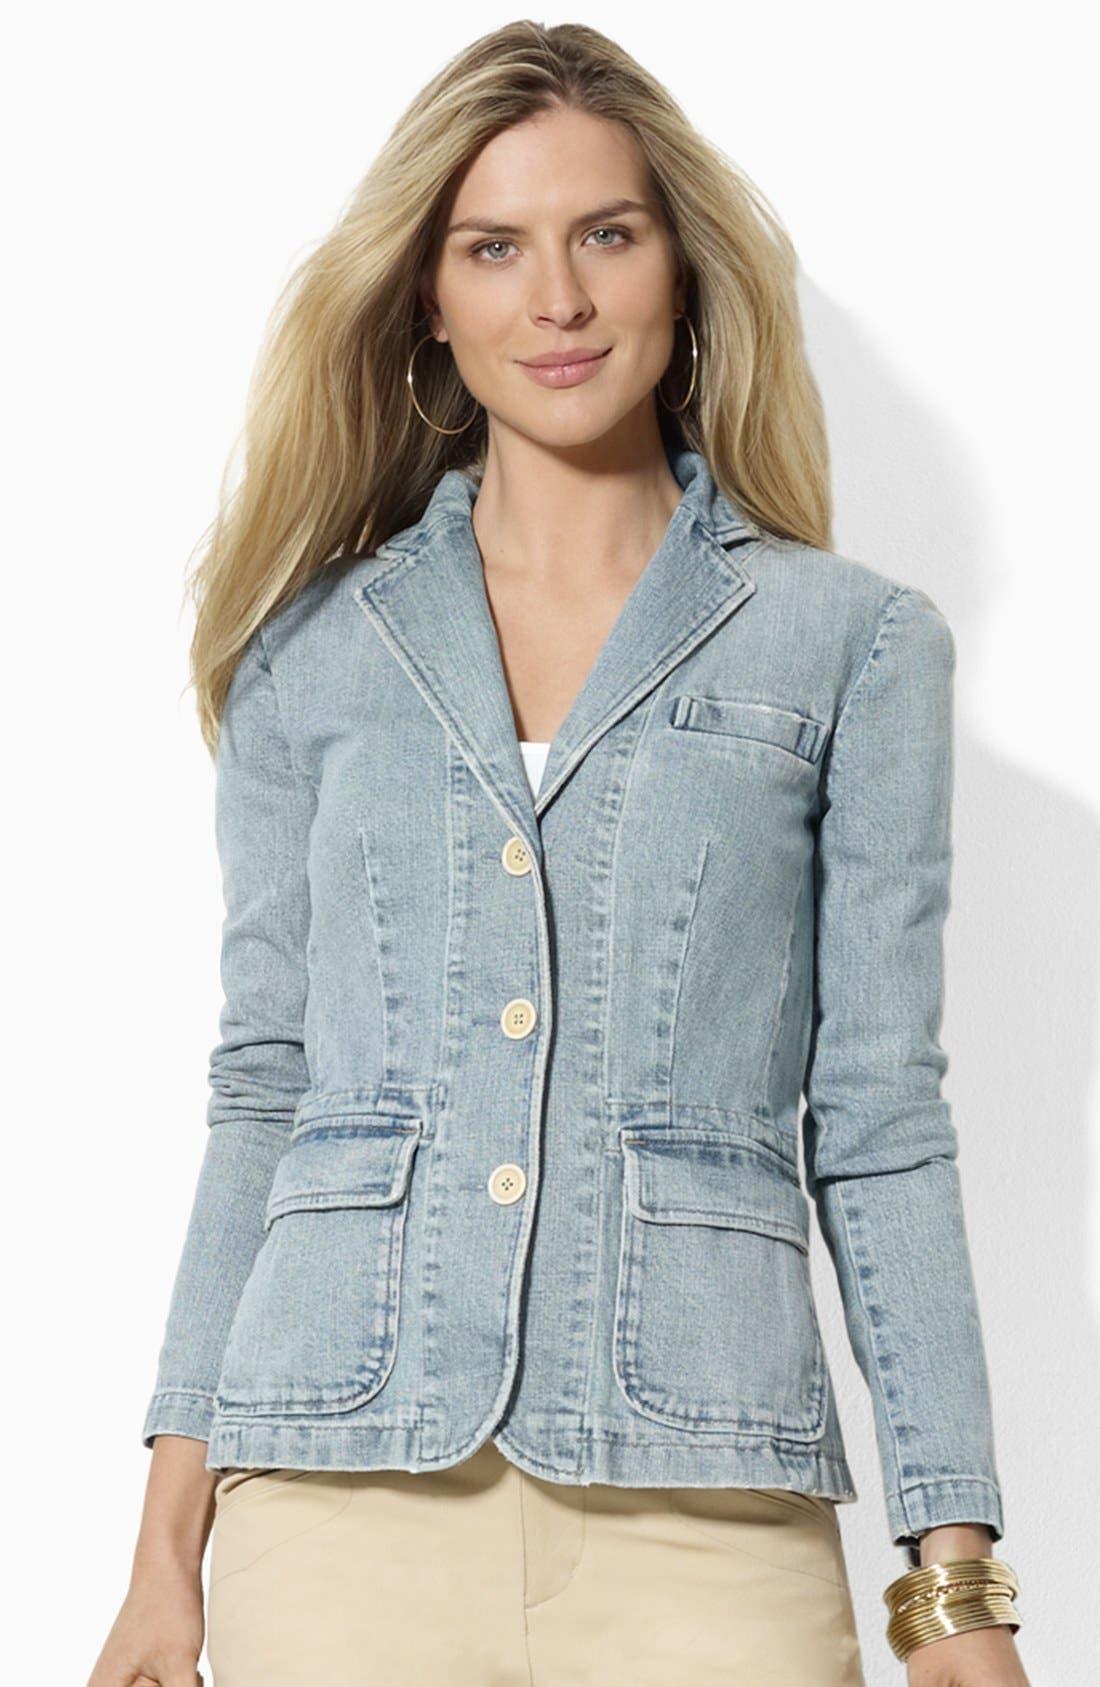 Alternate Image 1 Selected - Lauren Ralph Lauren Three Button Denim Blazer (Petite) (Online Only)